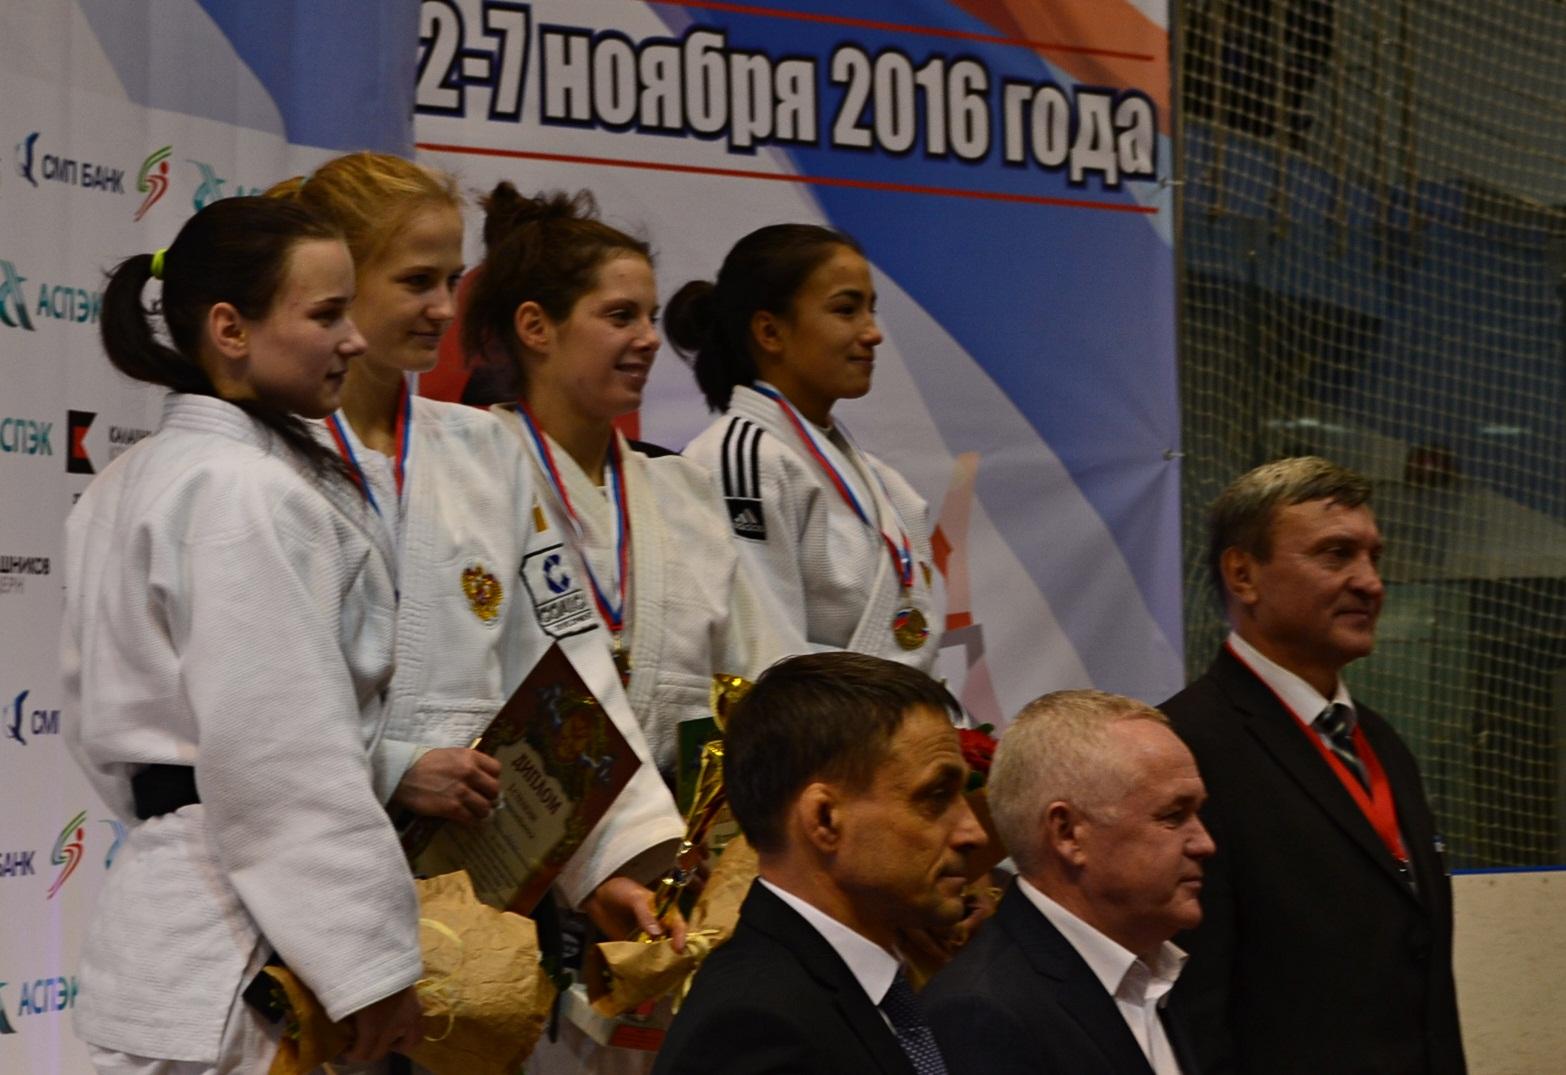 Александр Архипов — крайний справа. Фото: Александр Поскребышев